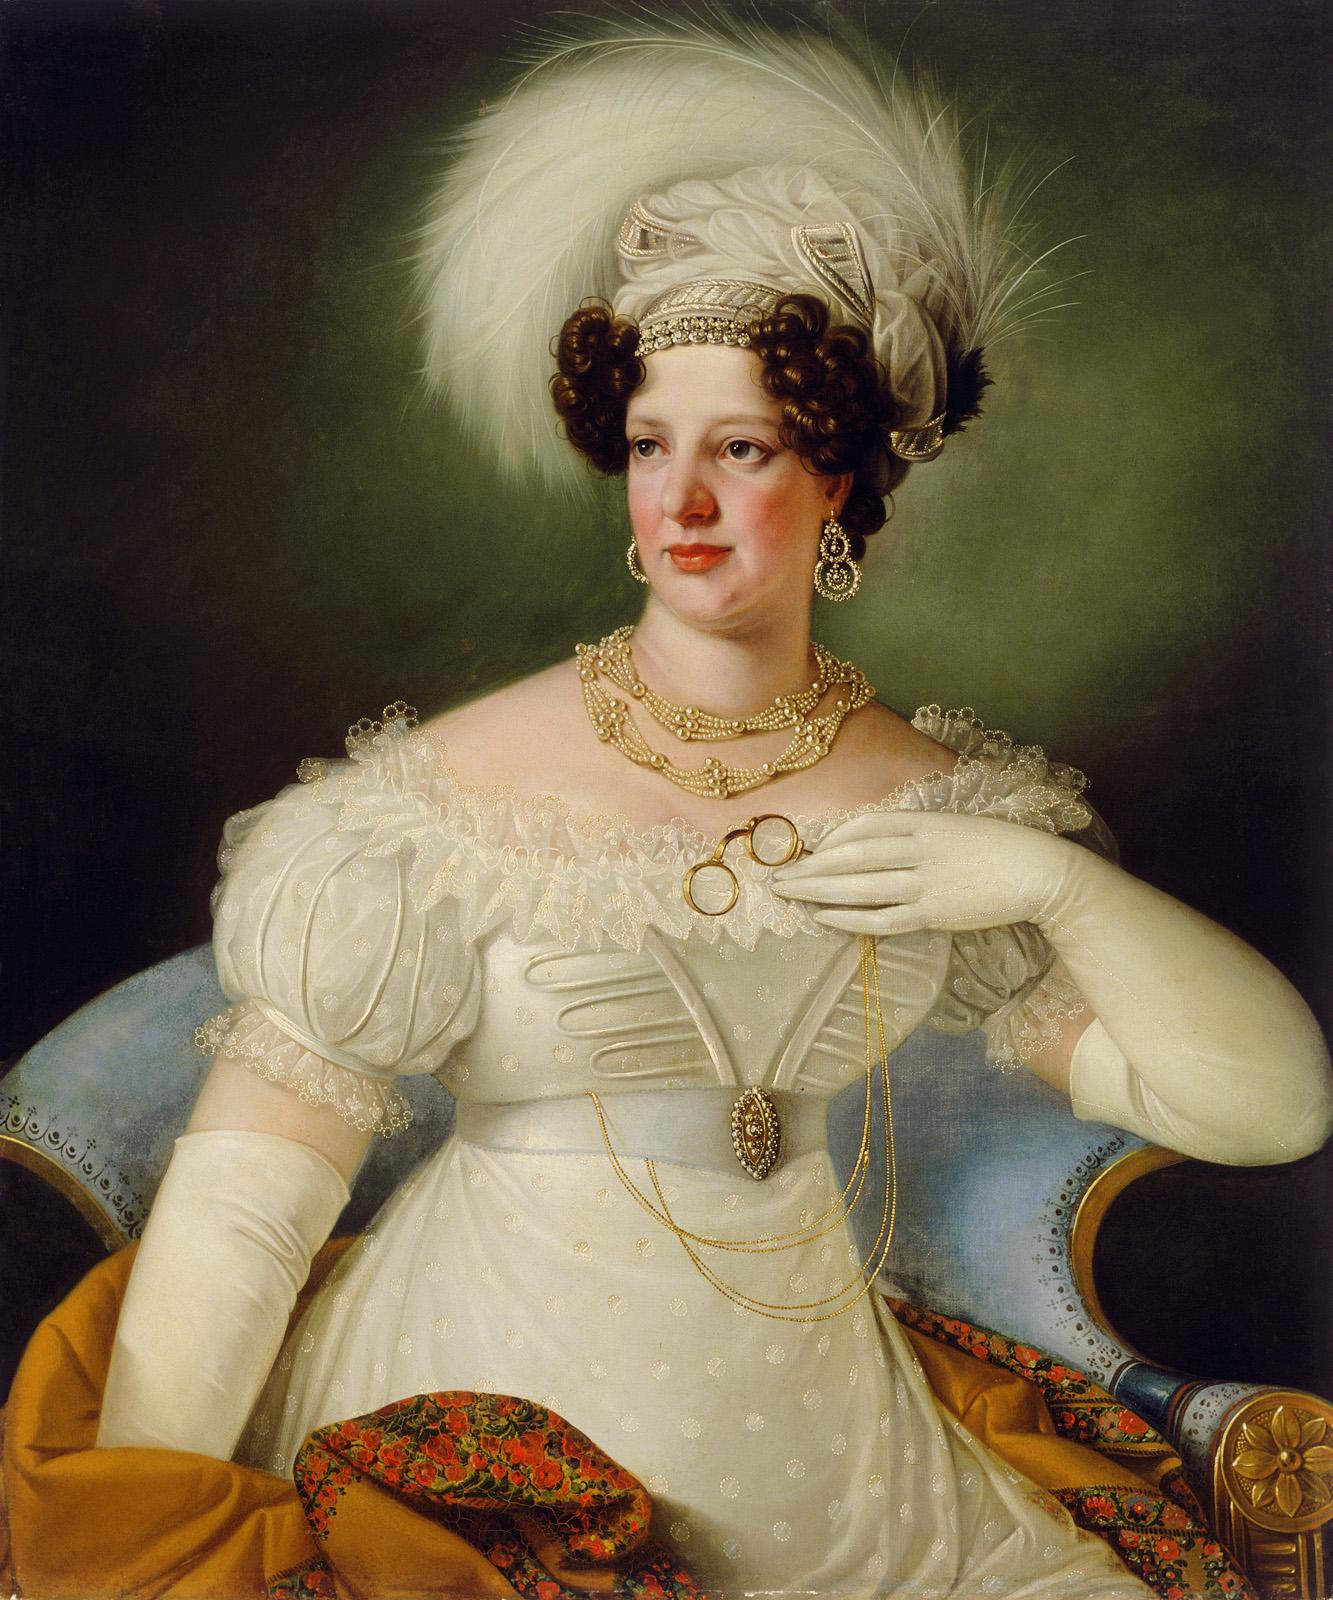 1822 Countess Cecilia d'Auersperg by Giuseppe Tominz (Narodna Galerija, Ljubljana Slovenia)